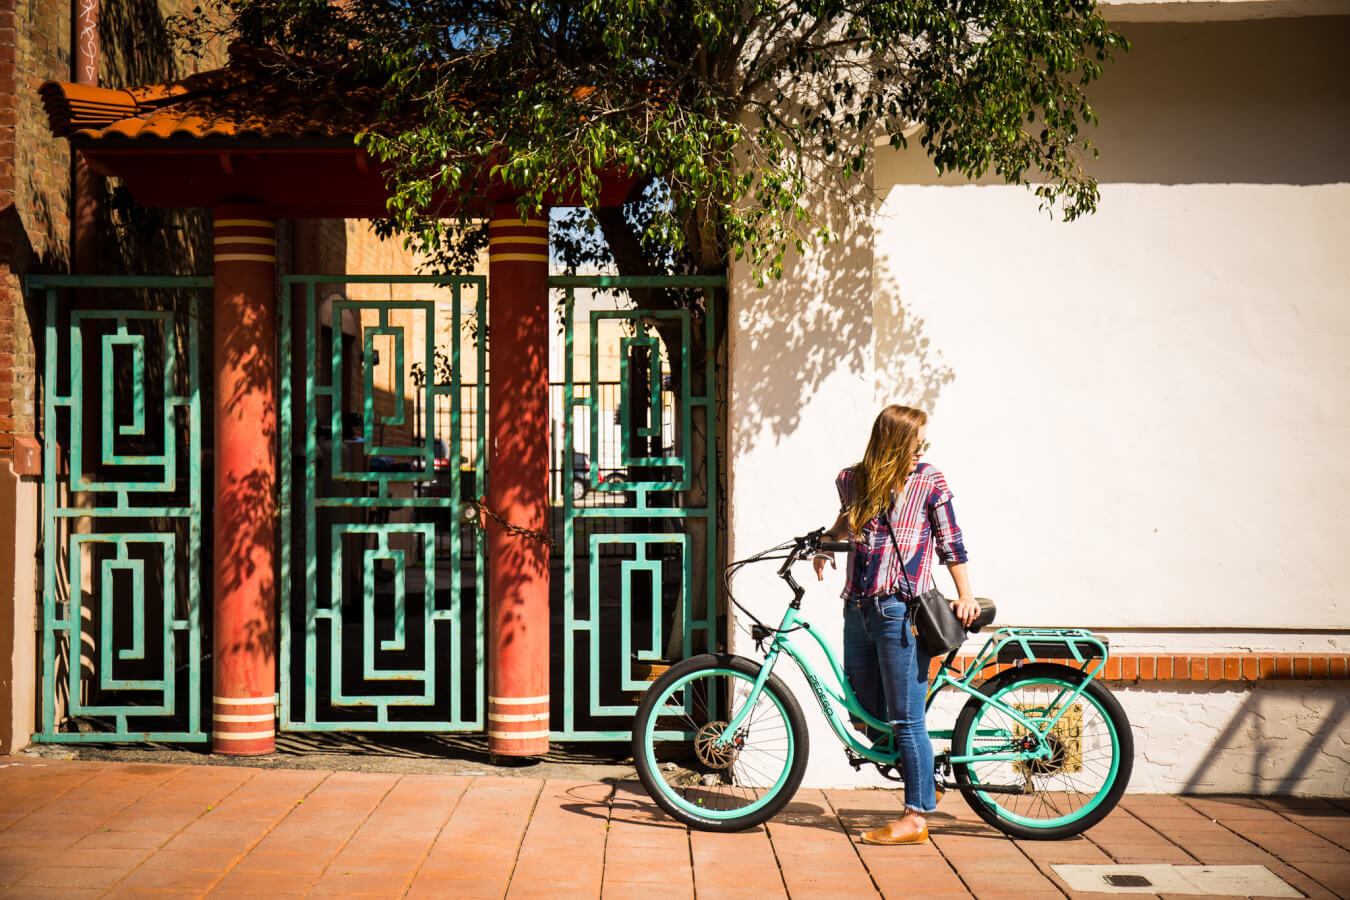 Electric Bike Downtown photoshoot